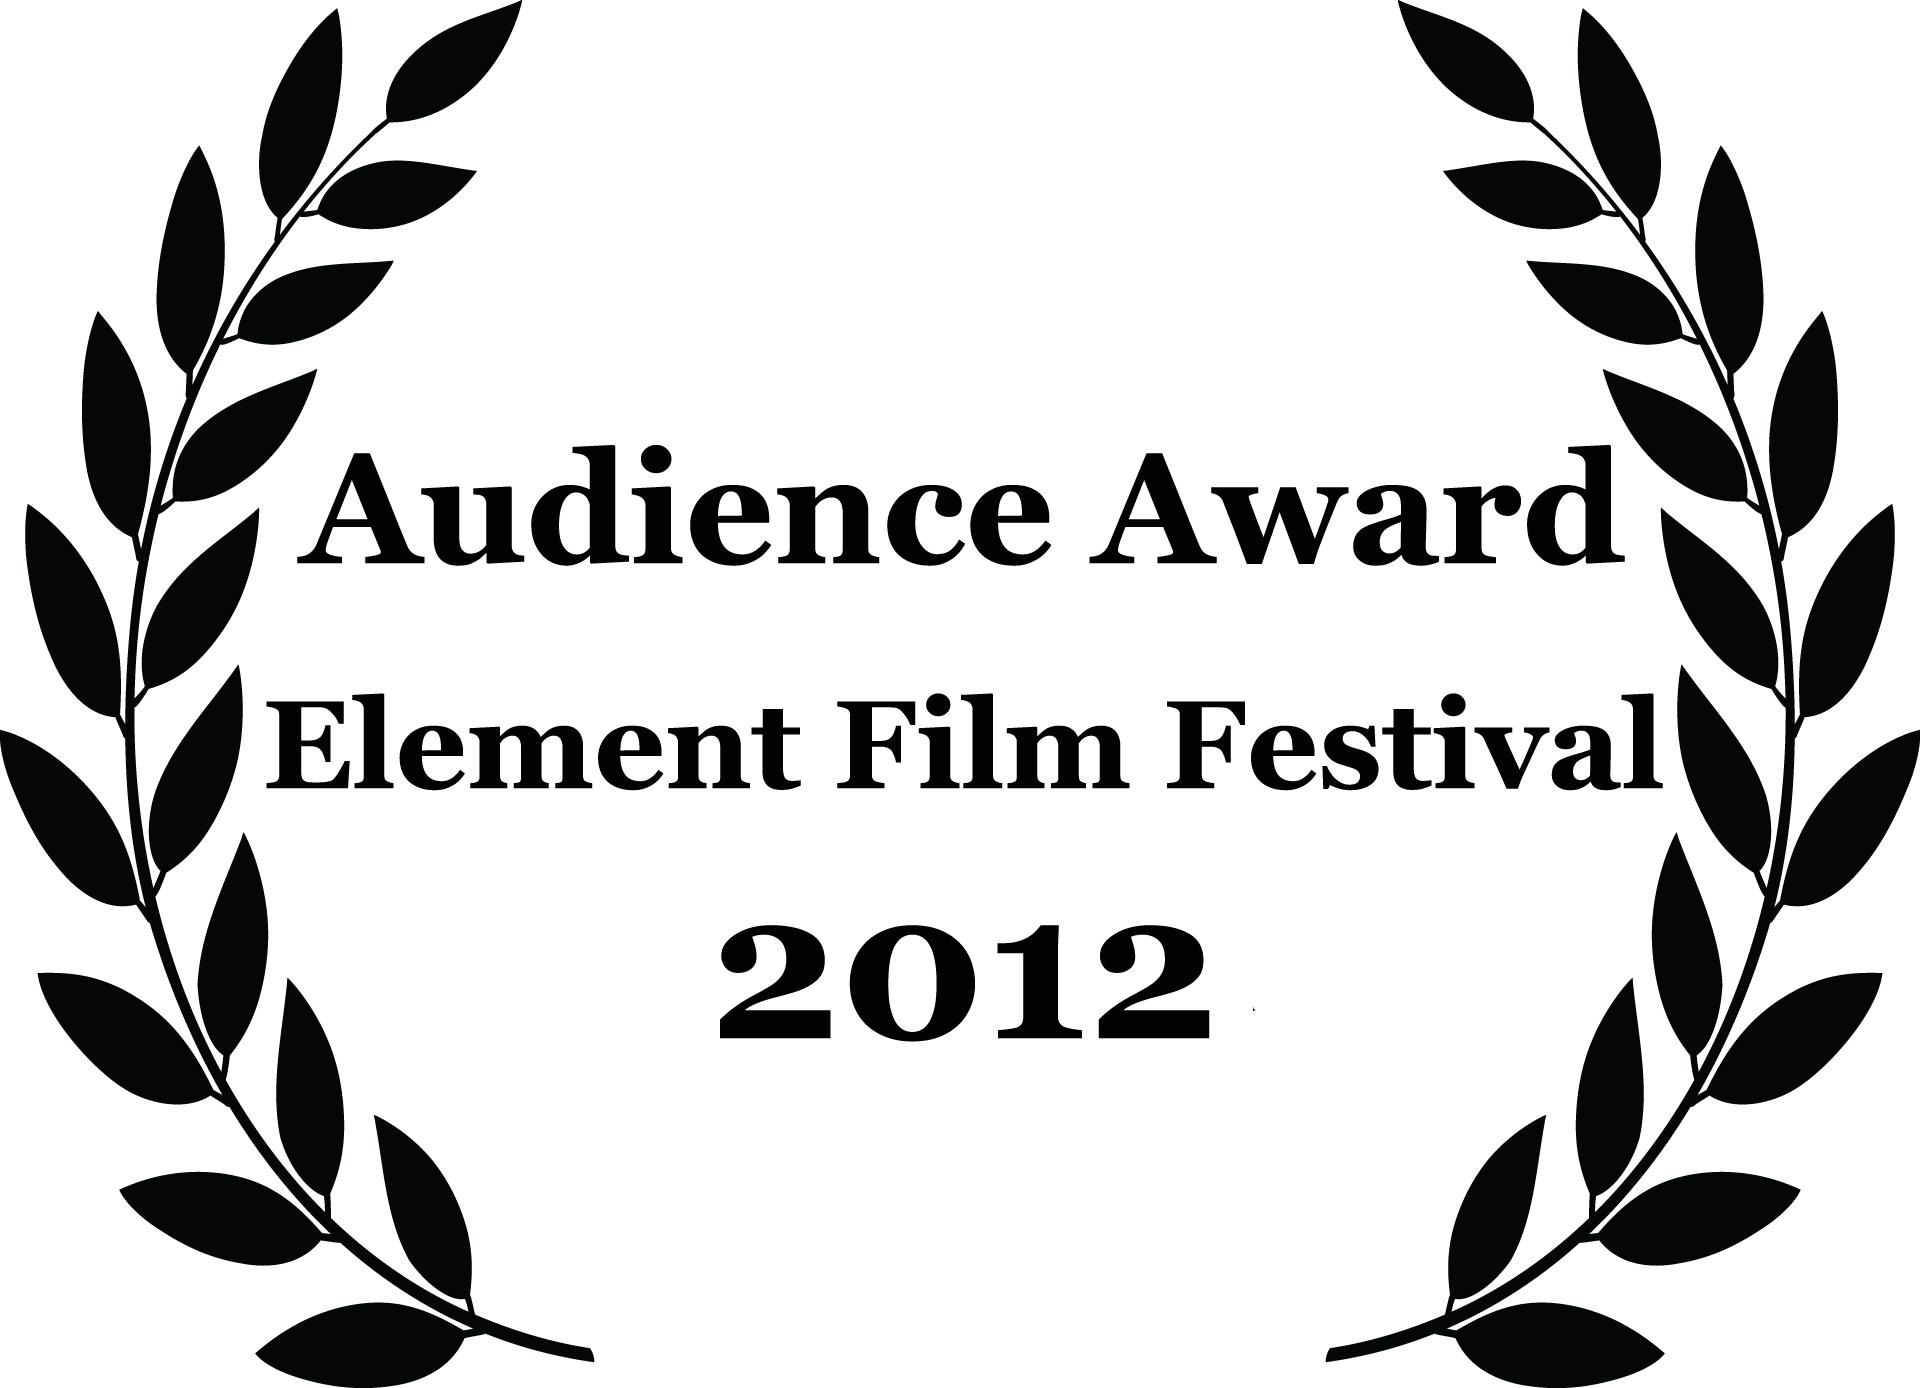 AK_Laurels_Element_2012_Audience_Award copy.jpg